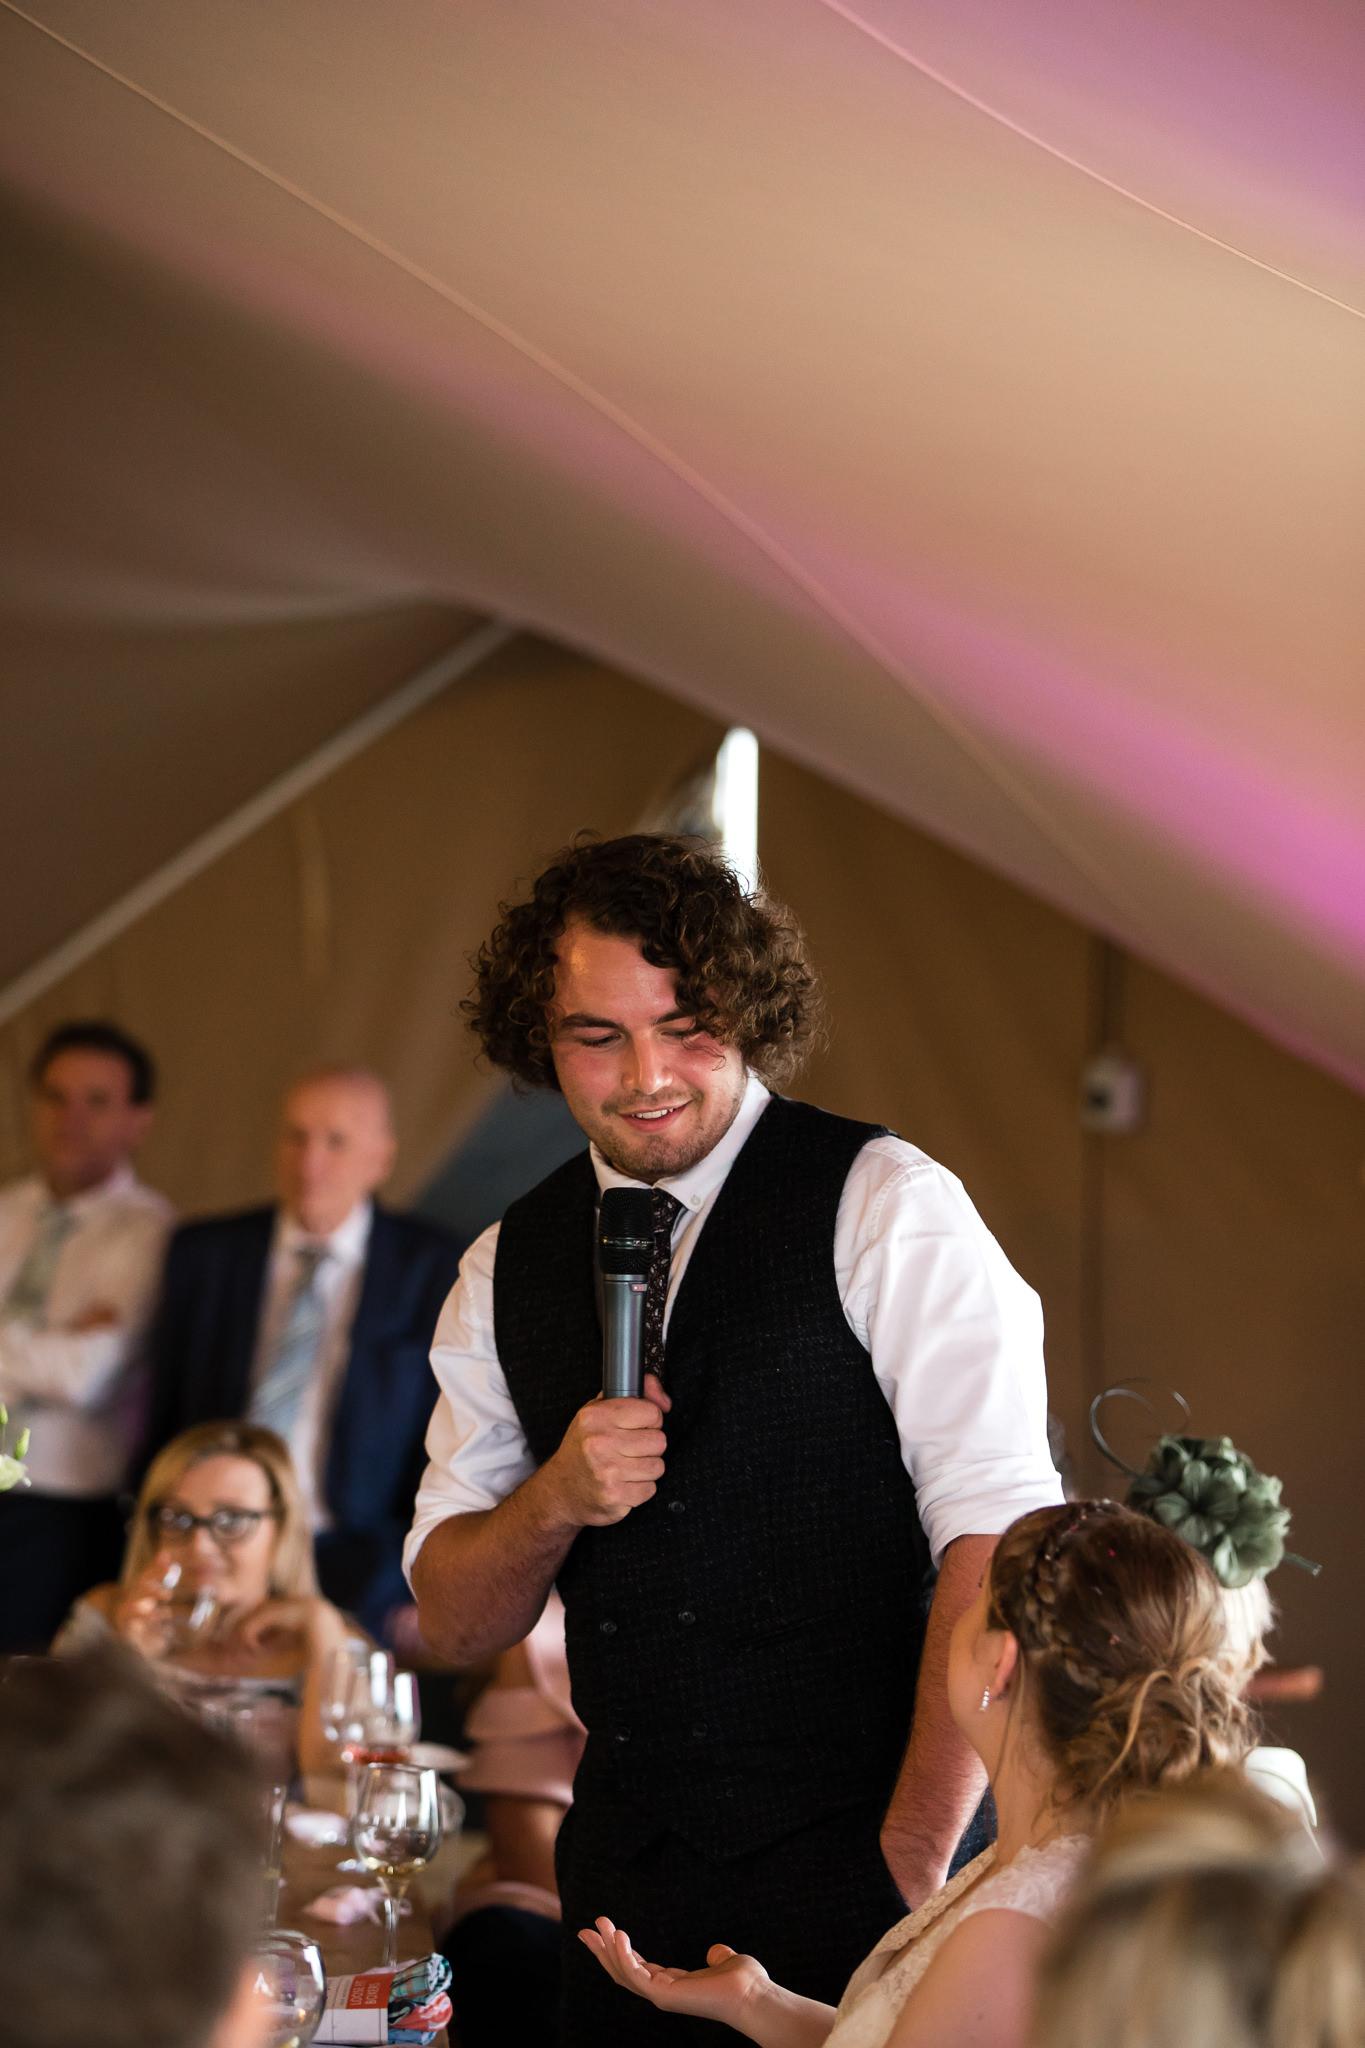 nottingham wedding61